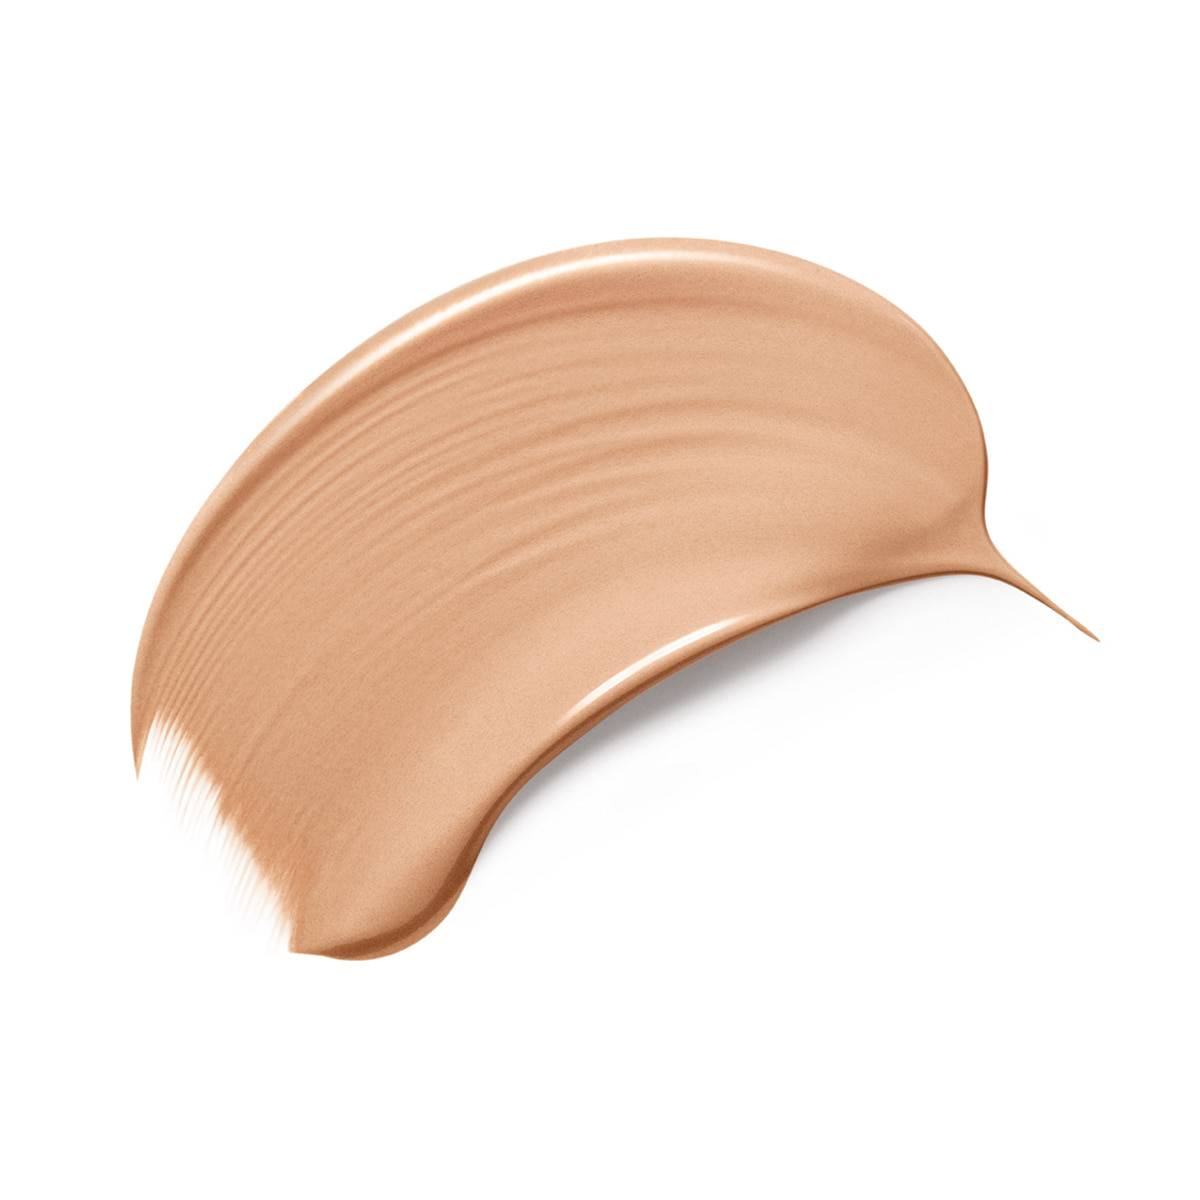 La Roche Posay ProduktSide Rosaliac CC Cream Texture